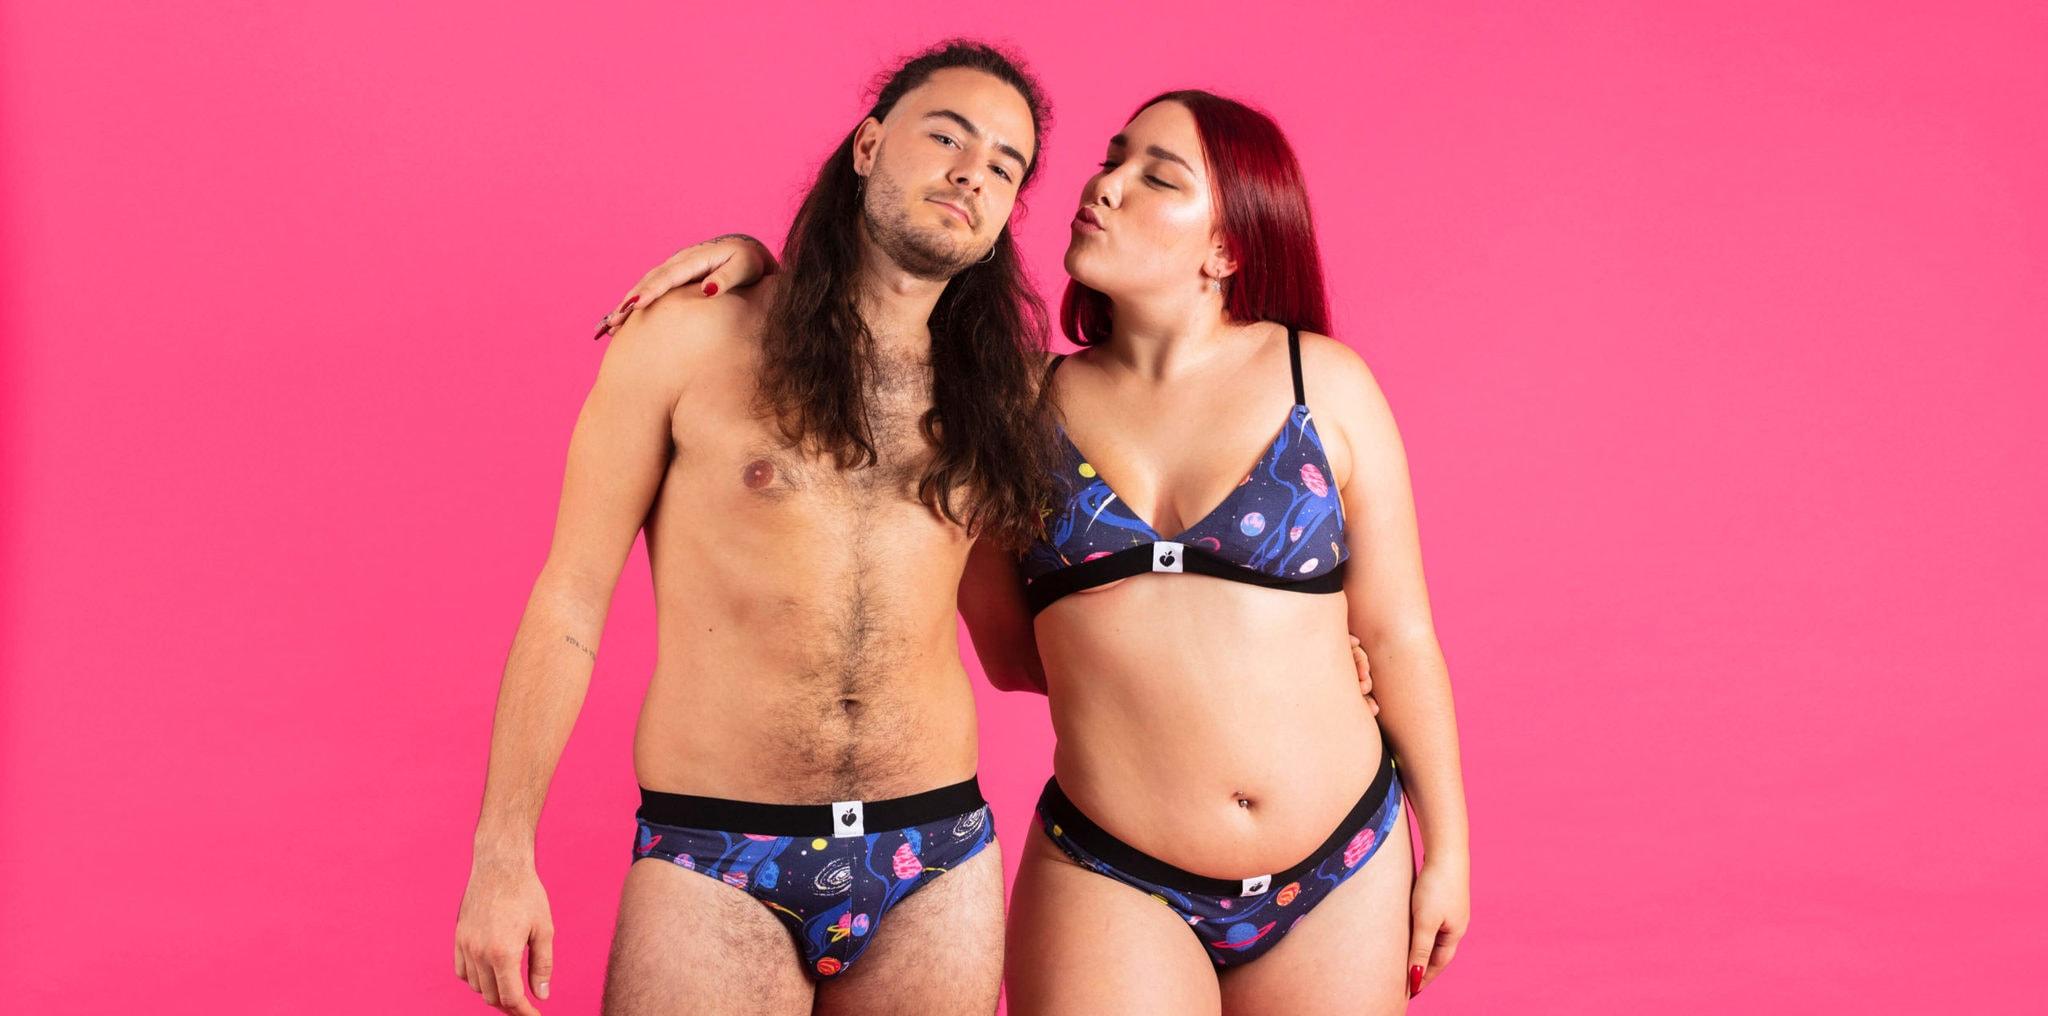 pareja ropa interior conjunto dabooty ecowear unisex